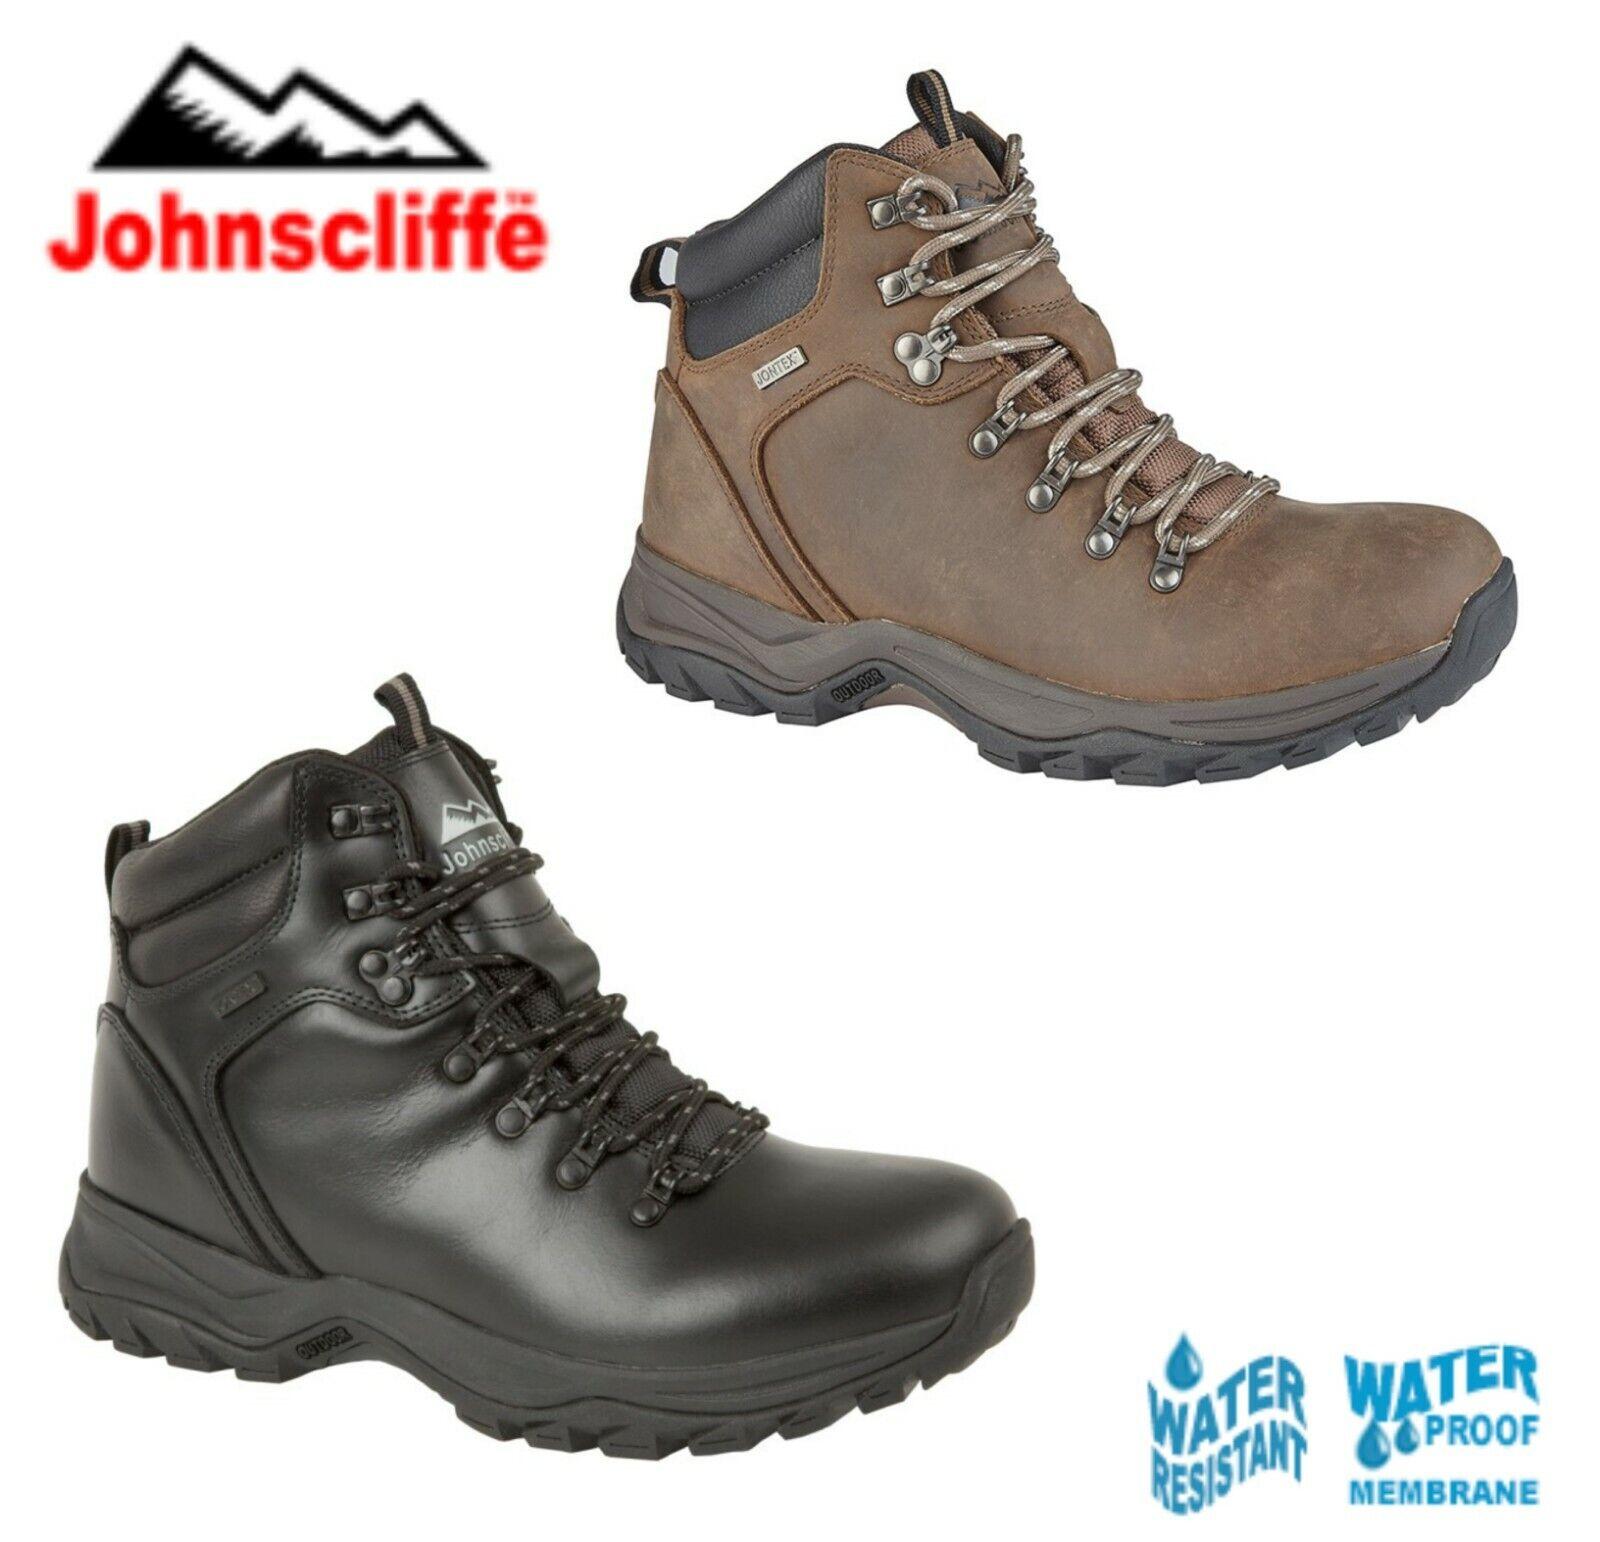 Johnscliffe Étanche braun Cuir schwarz Stiefel De Randonnée-Größes 6 7 8 9 10 11 12